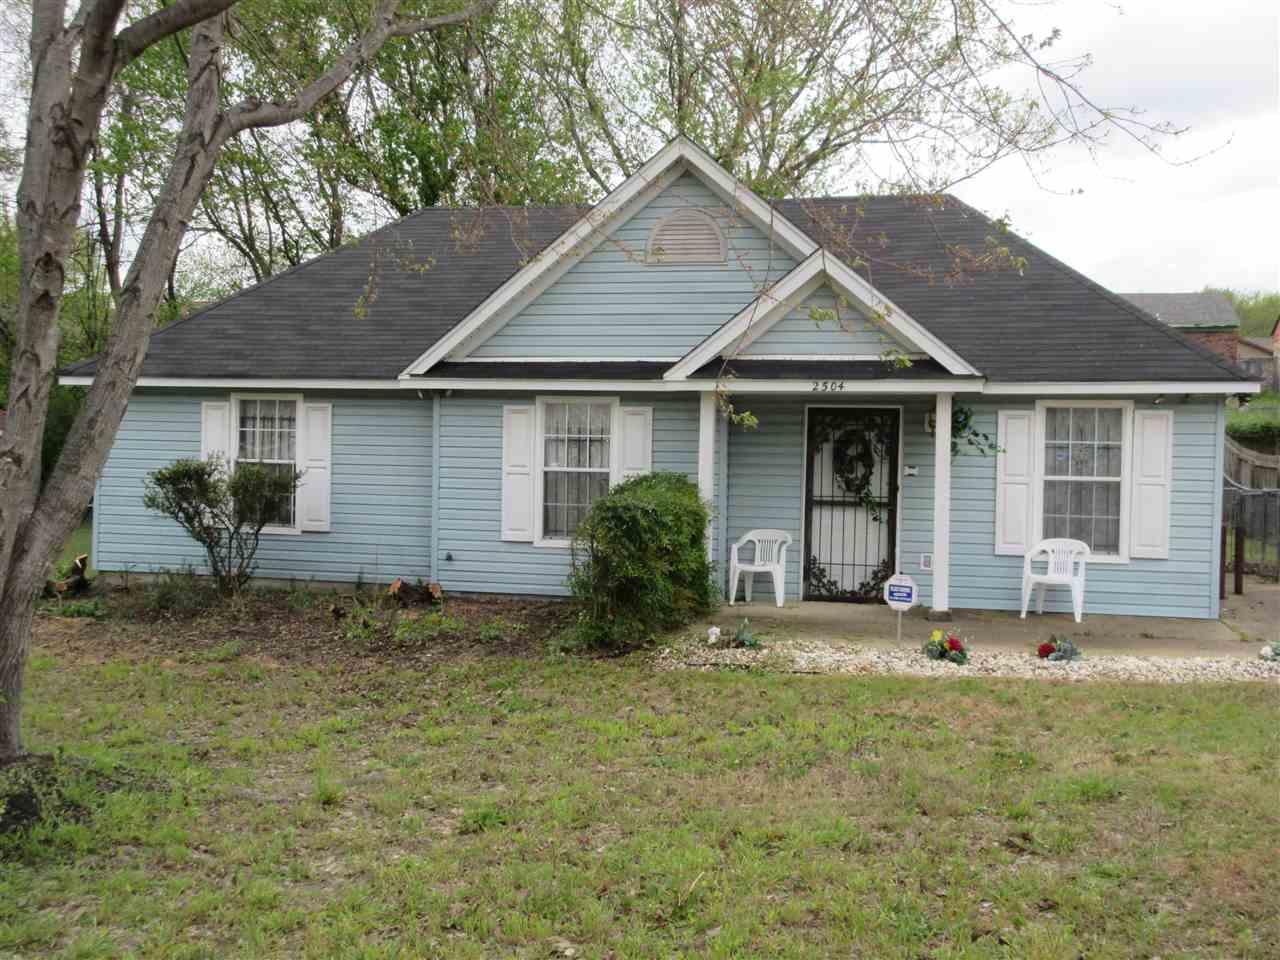 2504 Durham Memphis, TN 38127 - MLS #: 9997569